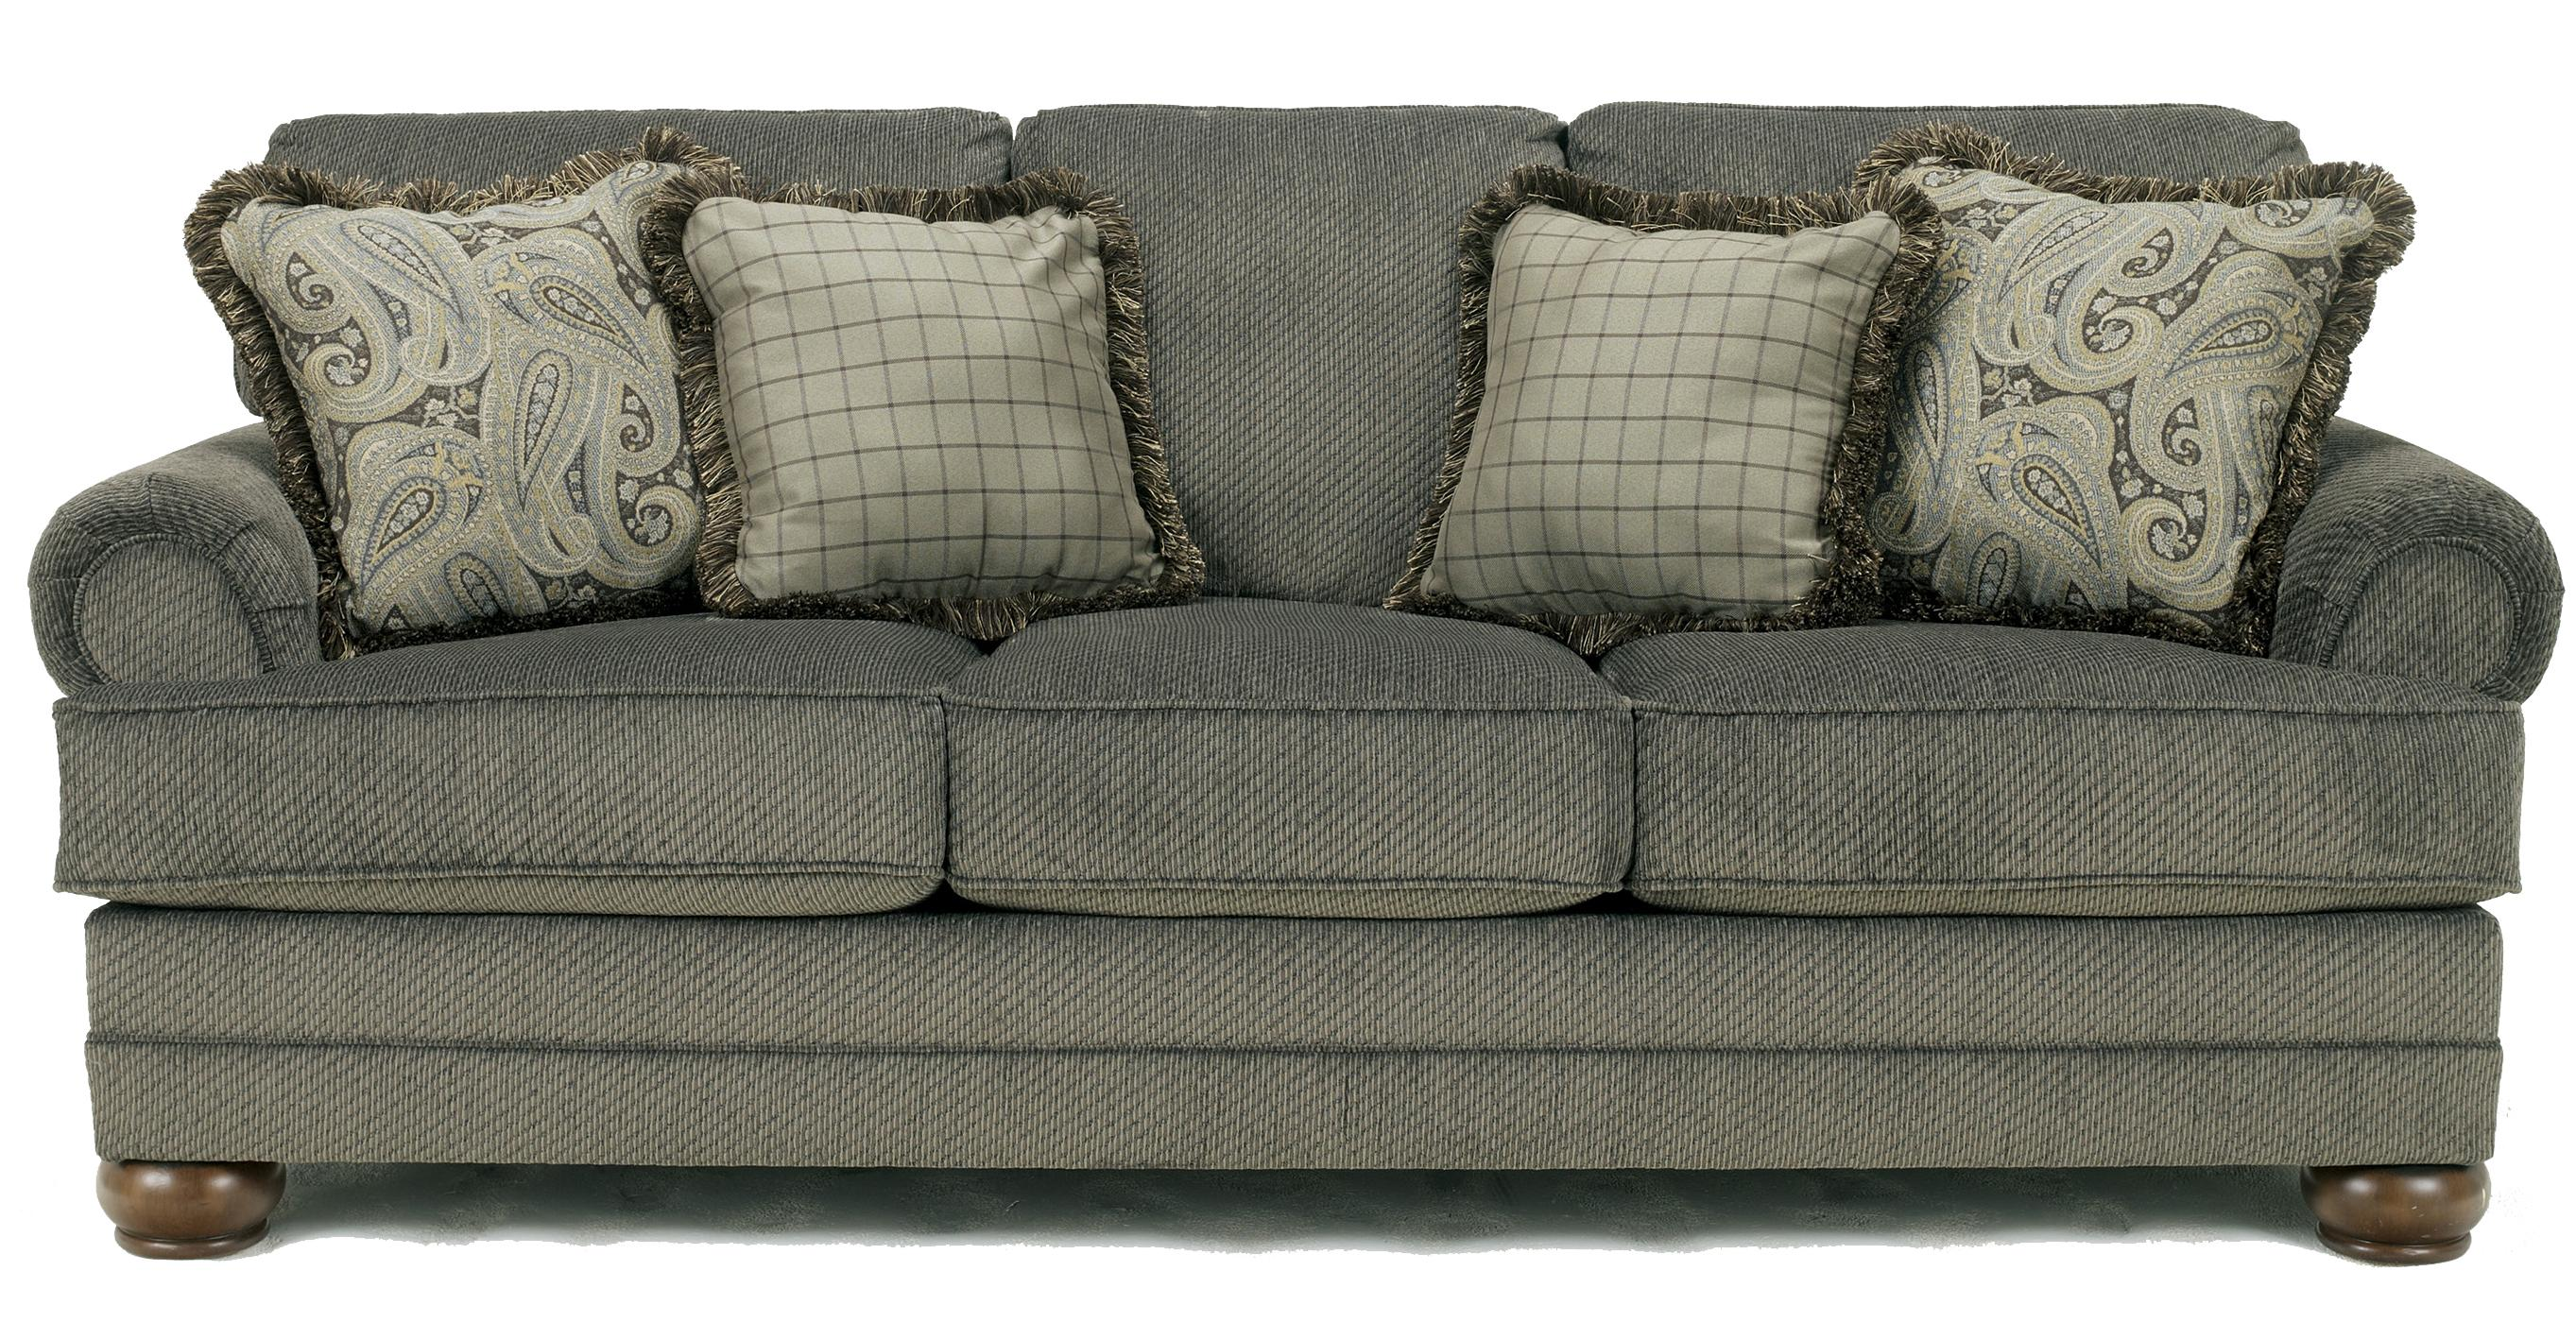 Signature Design by Ashley Parcal Estates - Basil Sofa - Item Number: 7400538